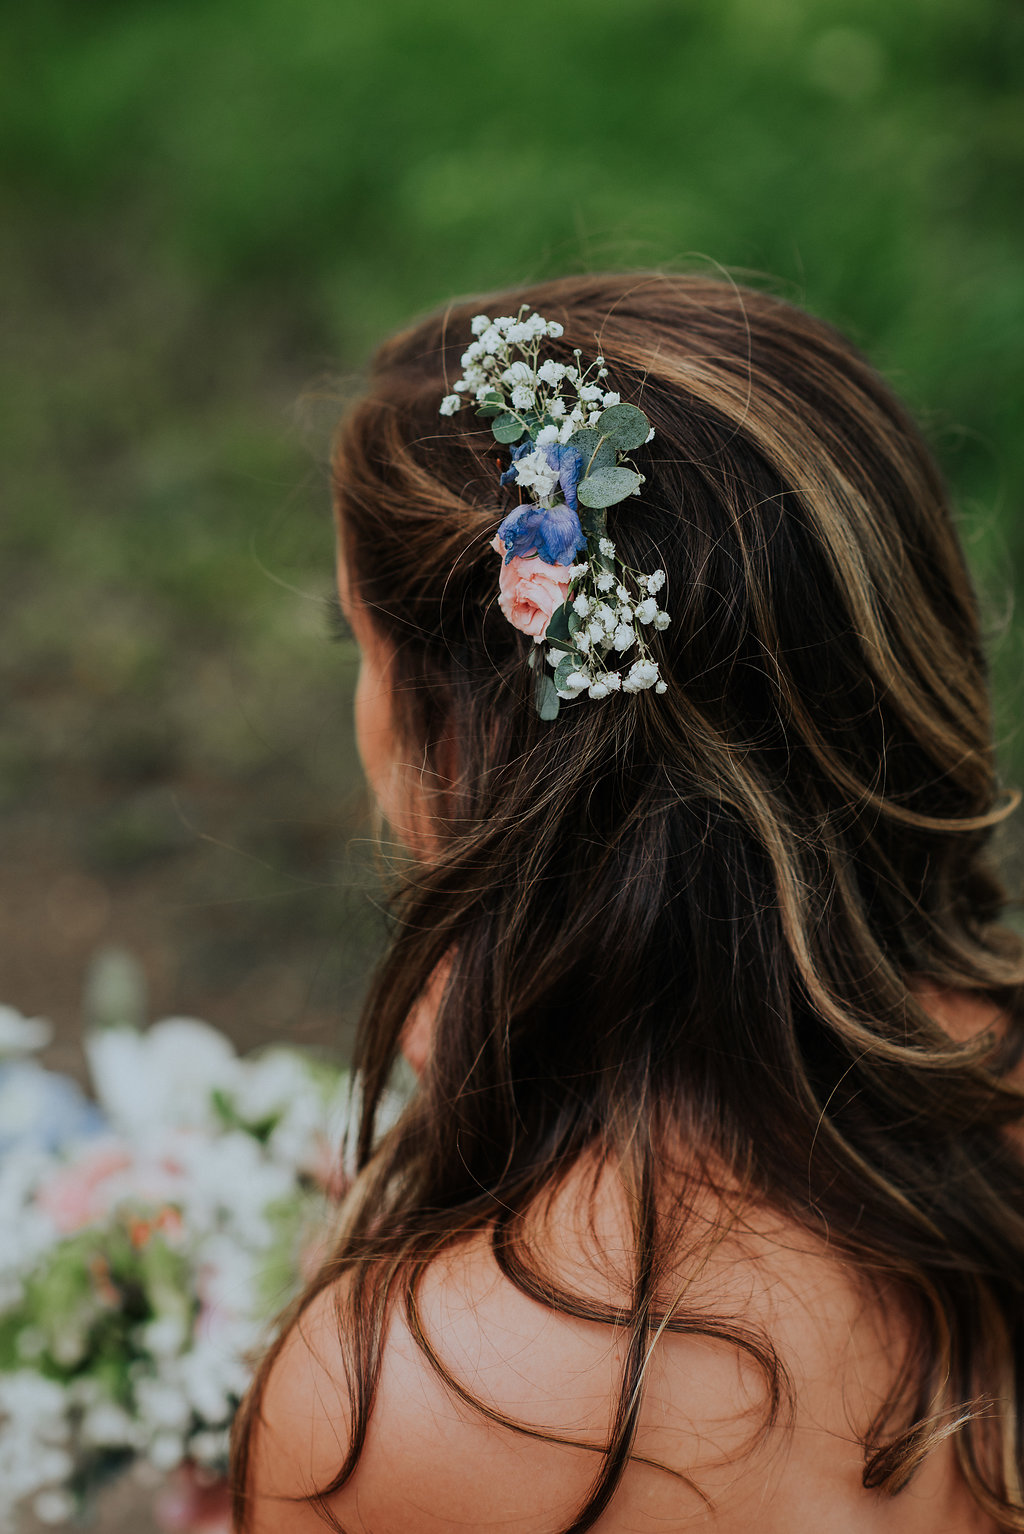 Hair Flowers Wedding - Bridesmaid Hair Ideas